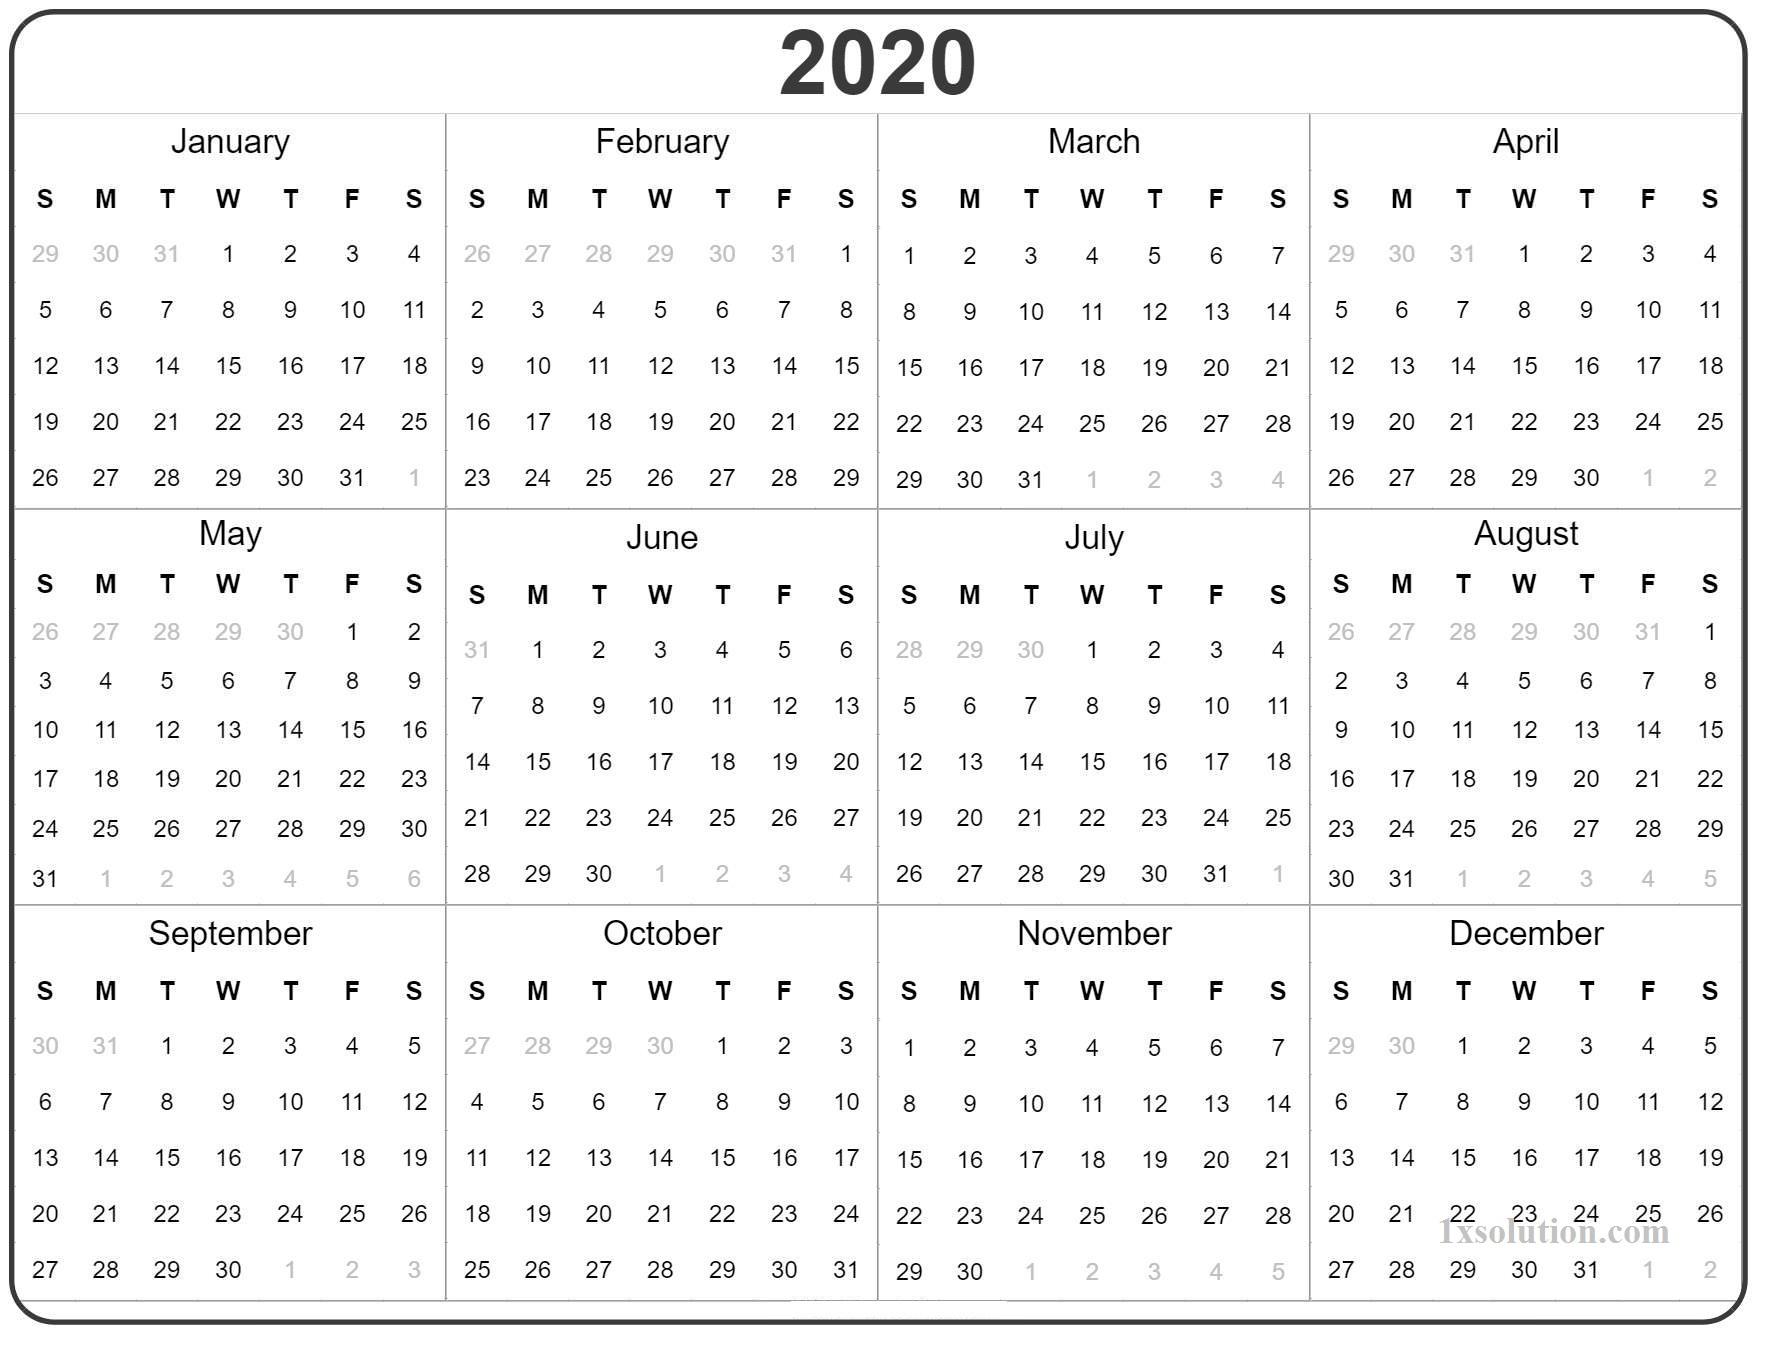 2020 Calendar Yearly